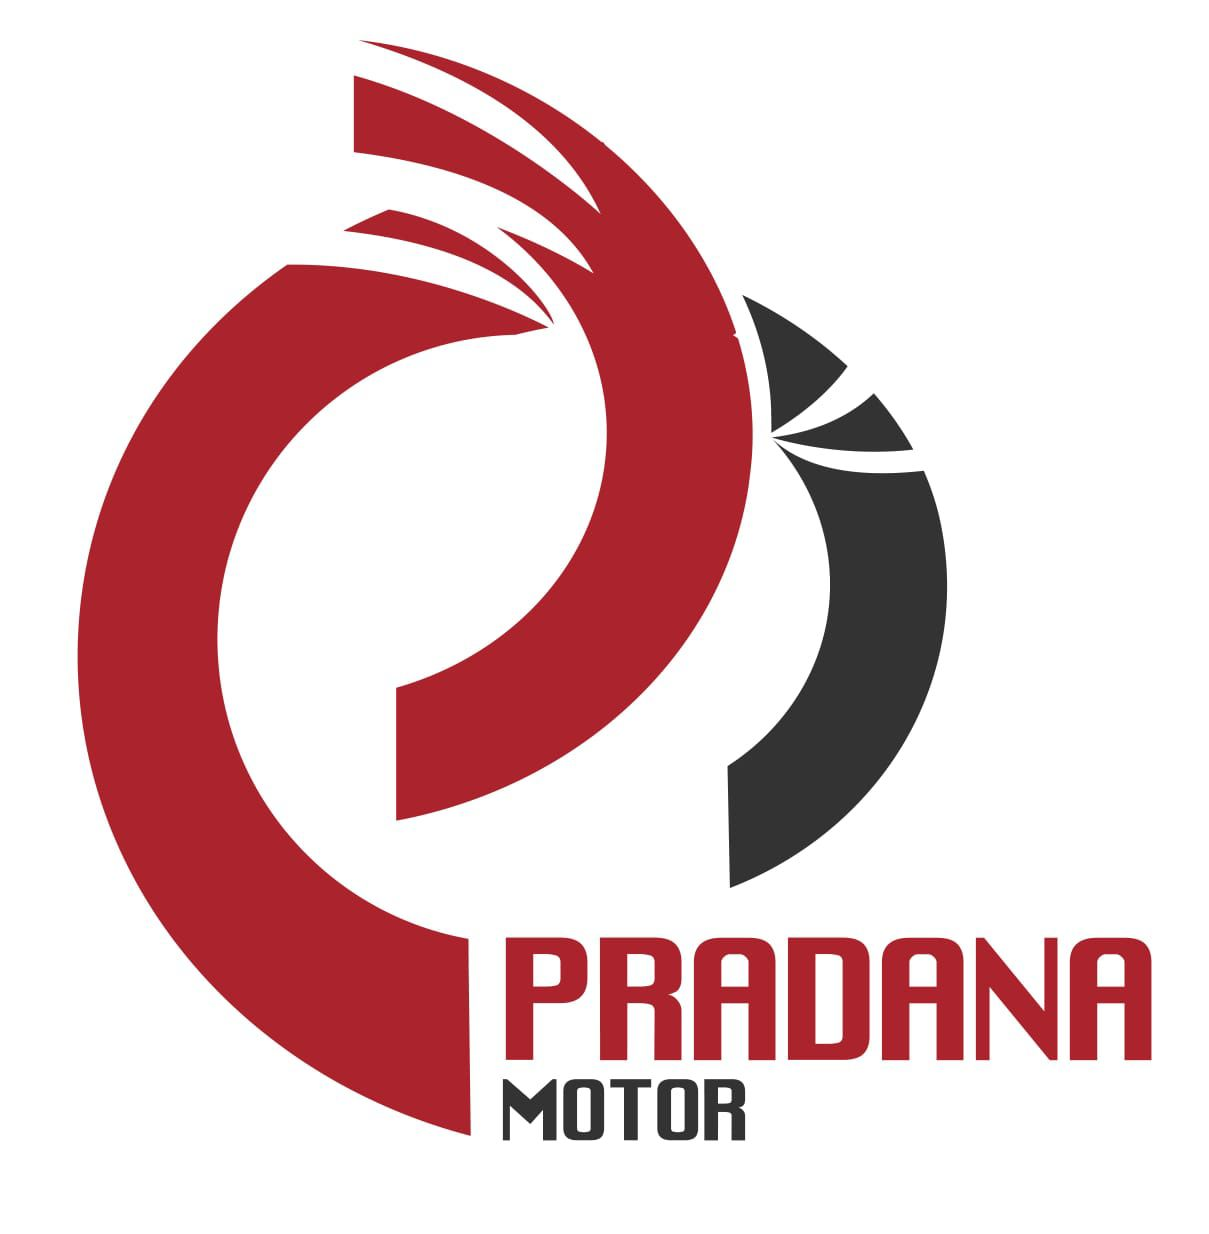 GESITS Pradana Motor